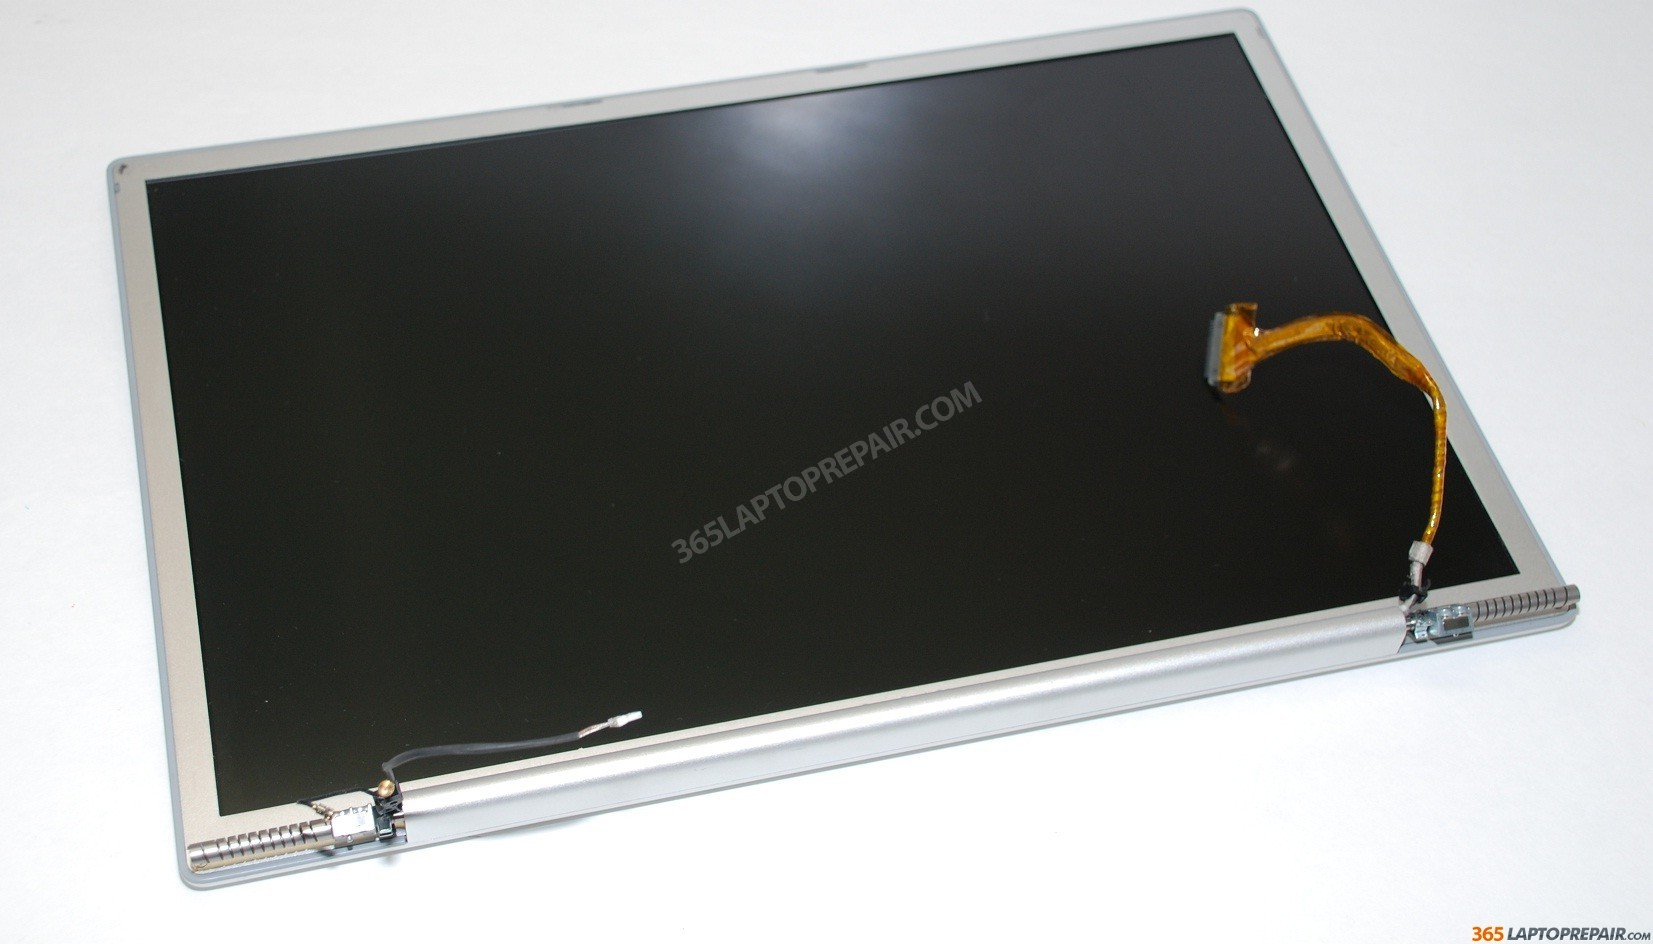 "Apple Powerbook G4 Aluminum 17"" LCD Screen w Back Cover"